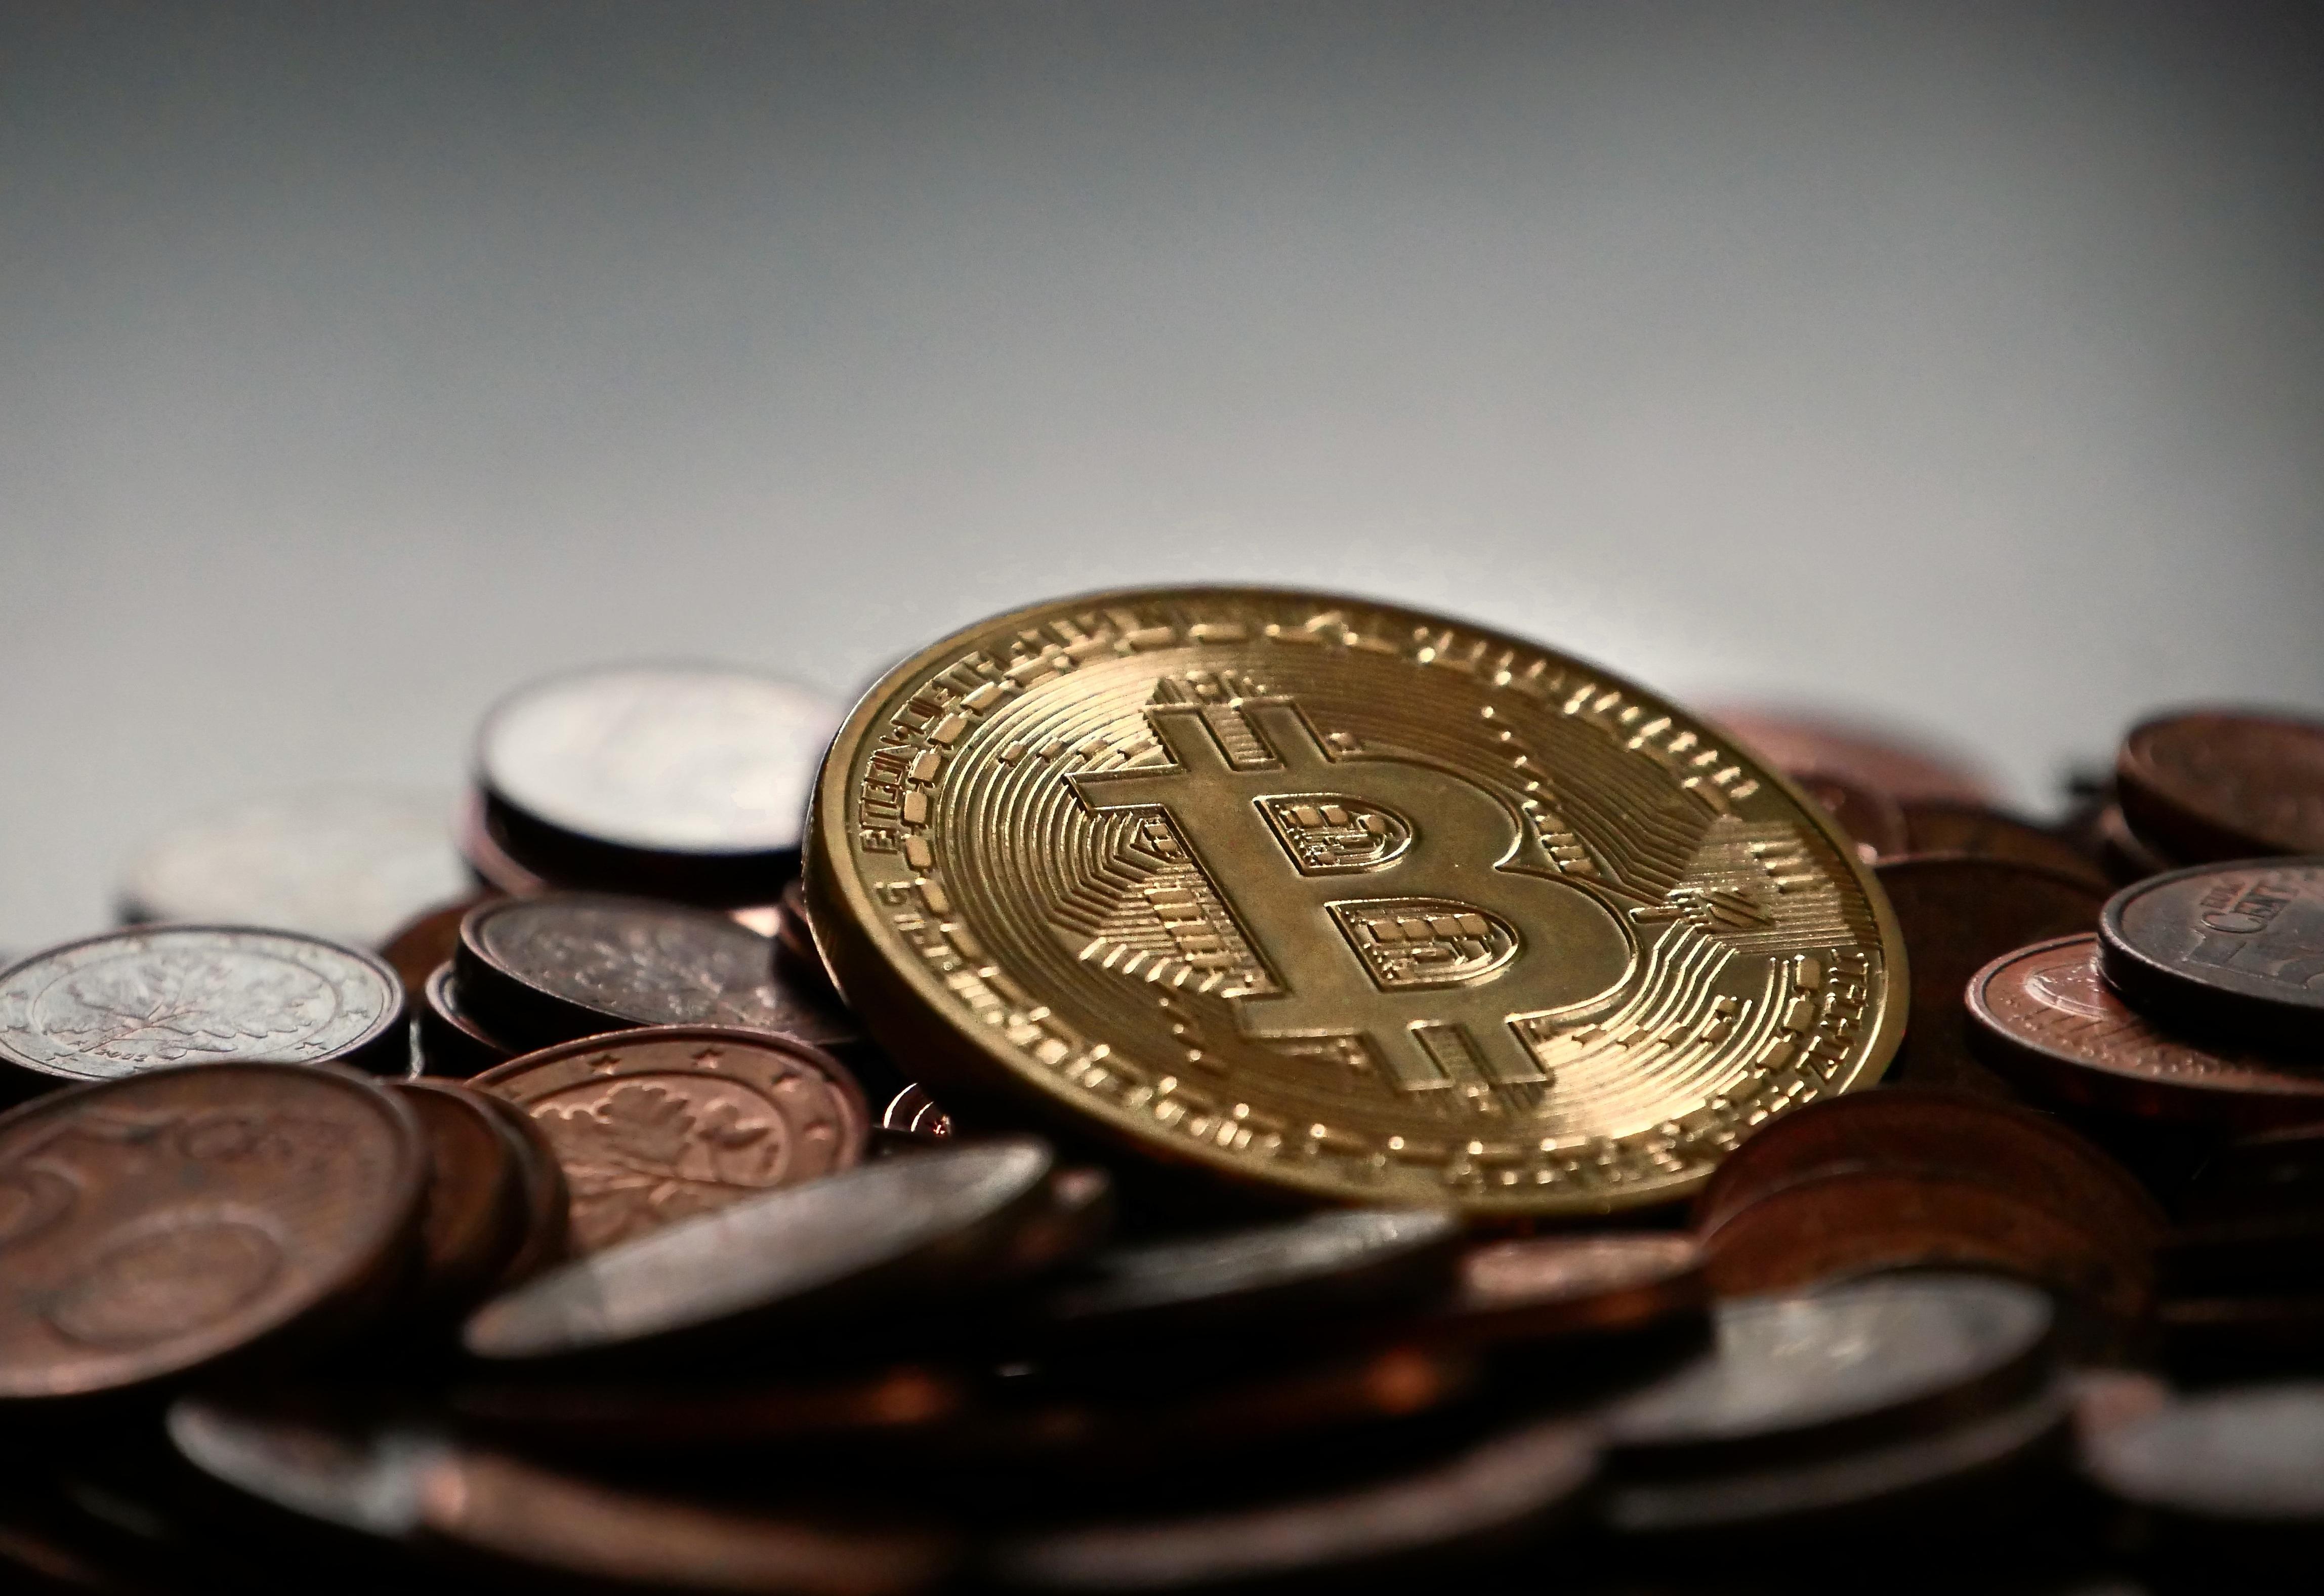 Blockchain isn't just for Bitcoin